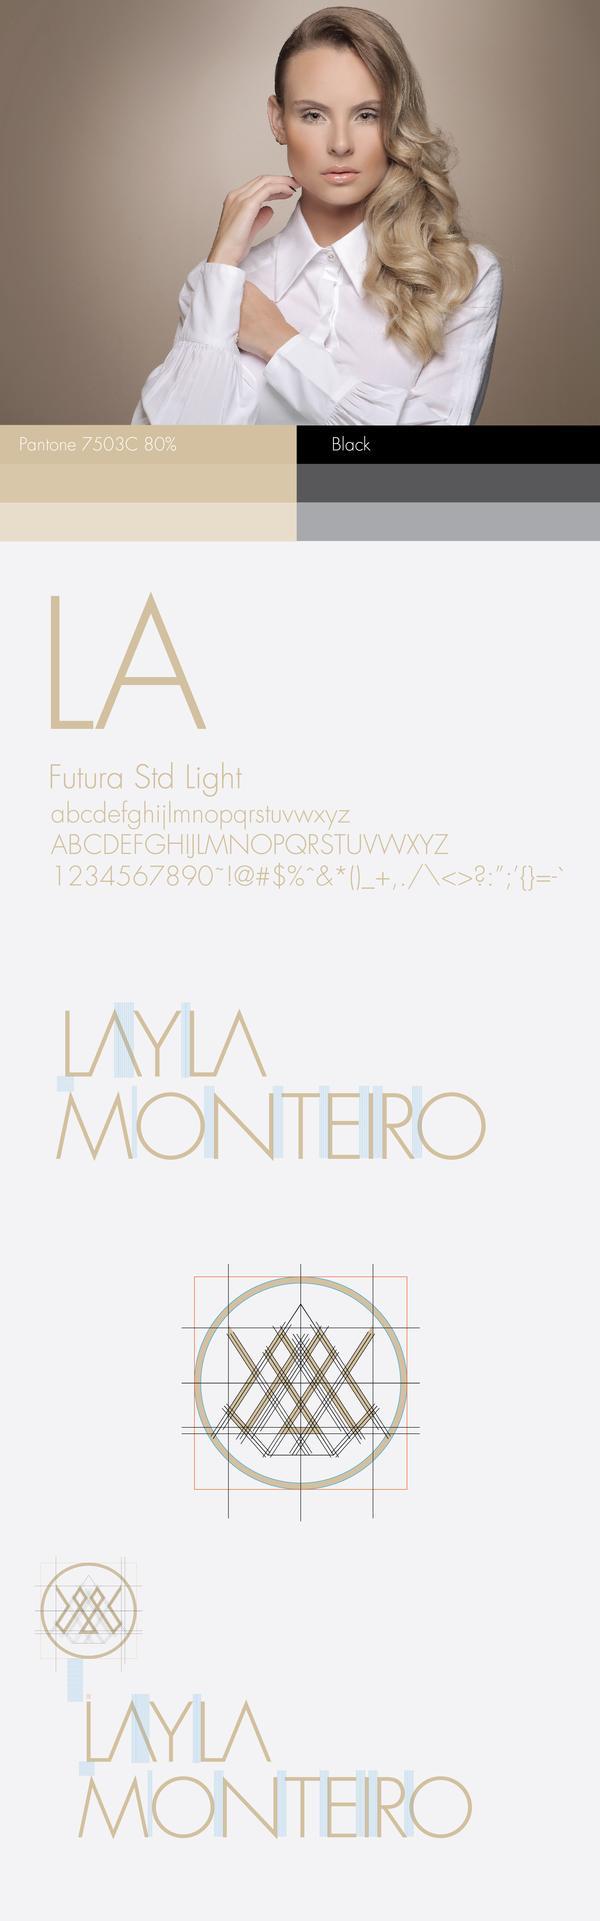 Layla Monteiro